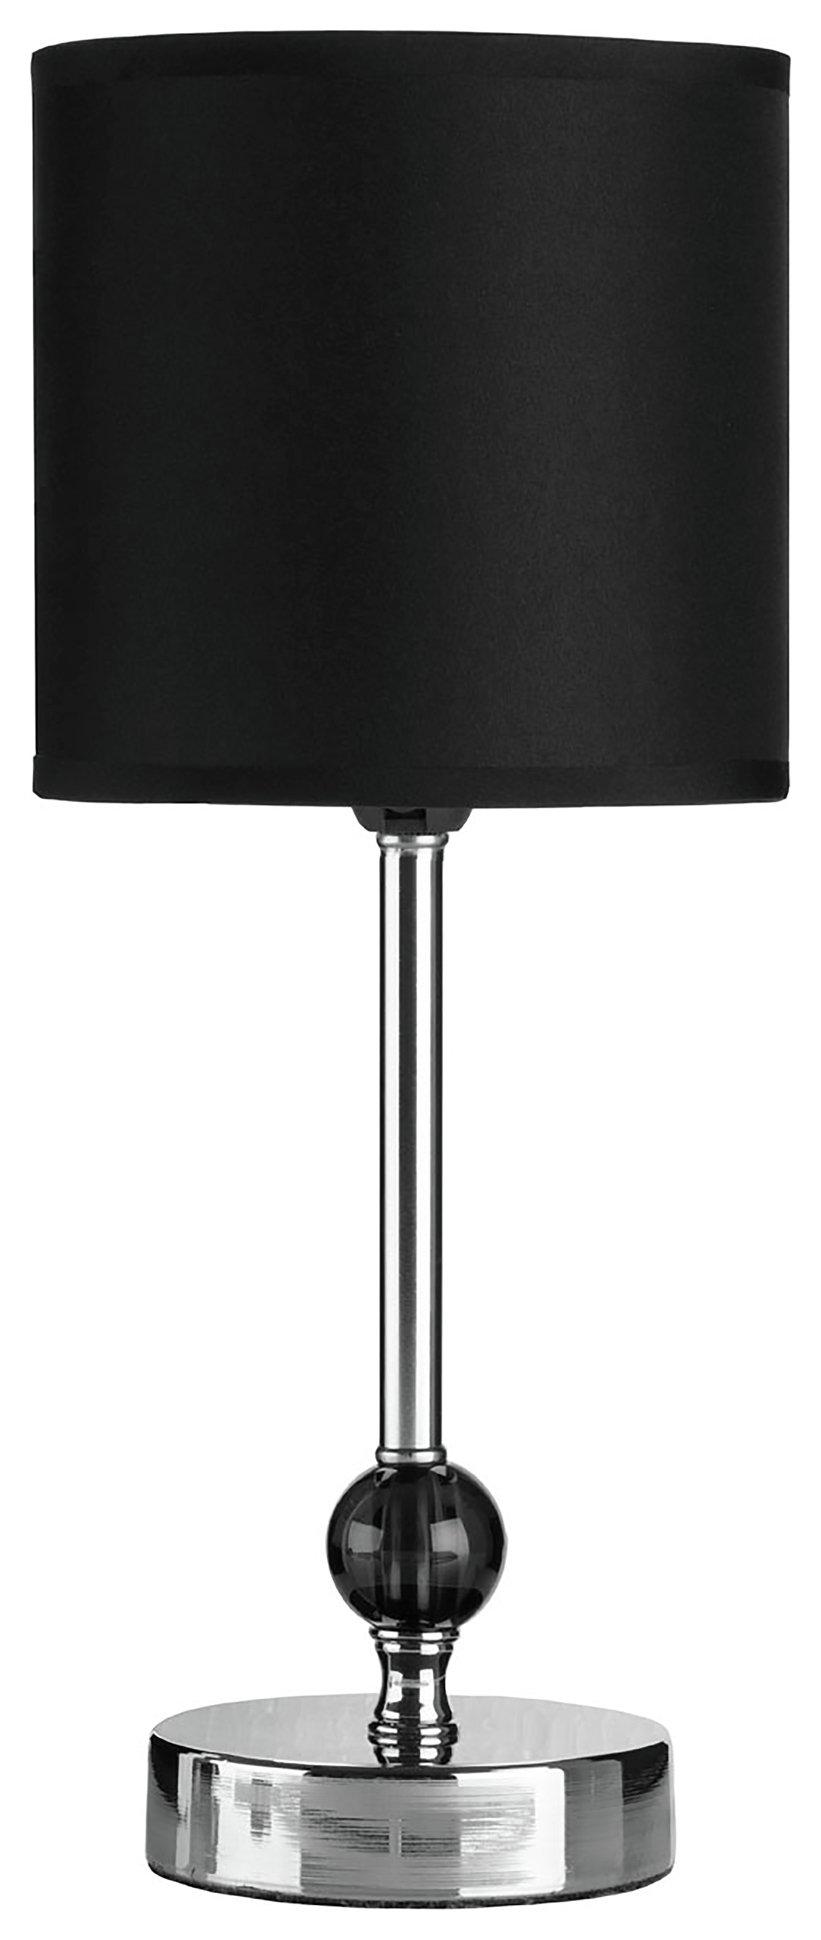 Image of Acrylic Ball - Table Lamp - Chrome & Black